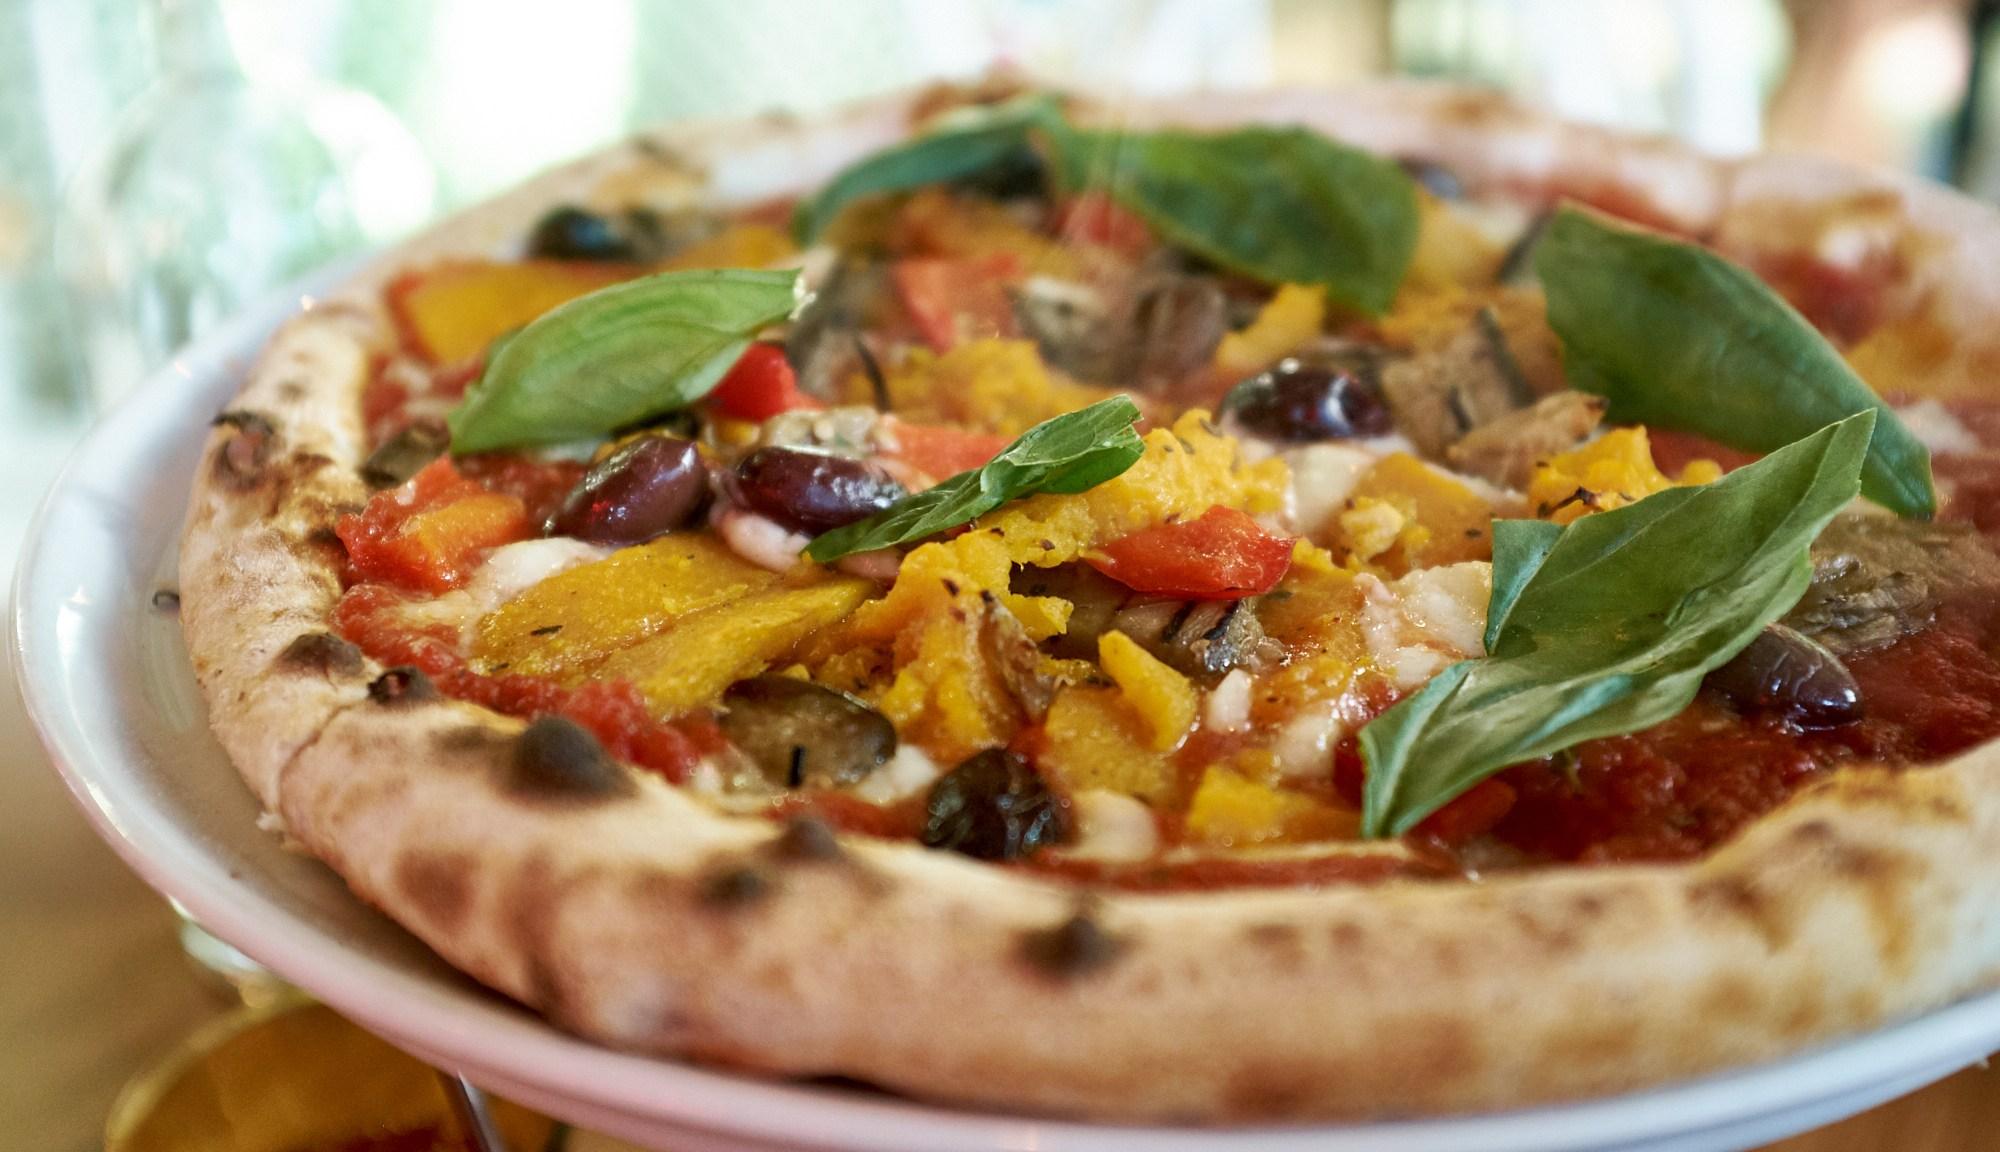 Vegan Pizza - A25 South Yarra